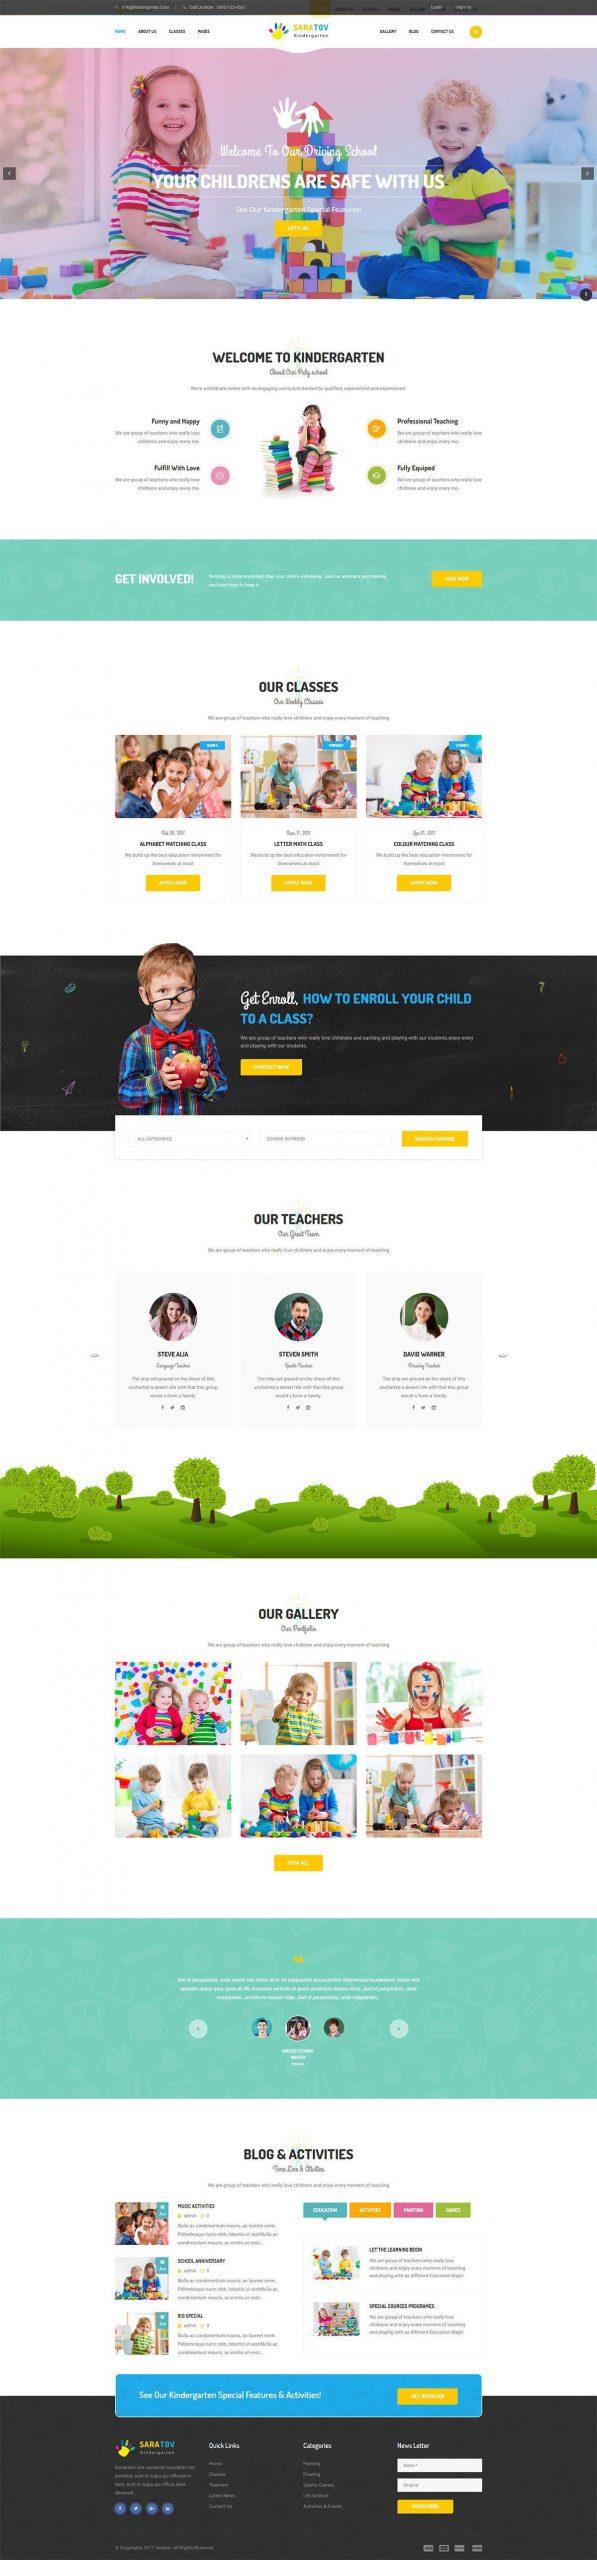 Giao Diện Website Giáo Dục Saratov